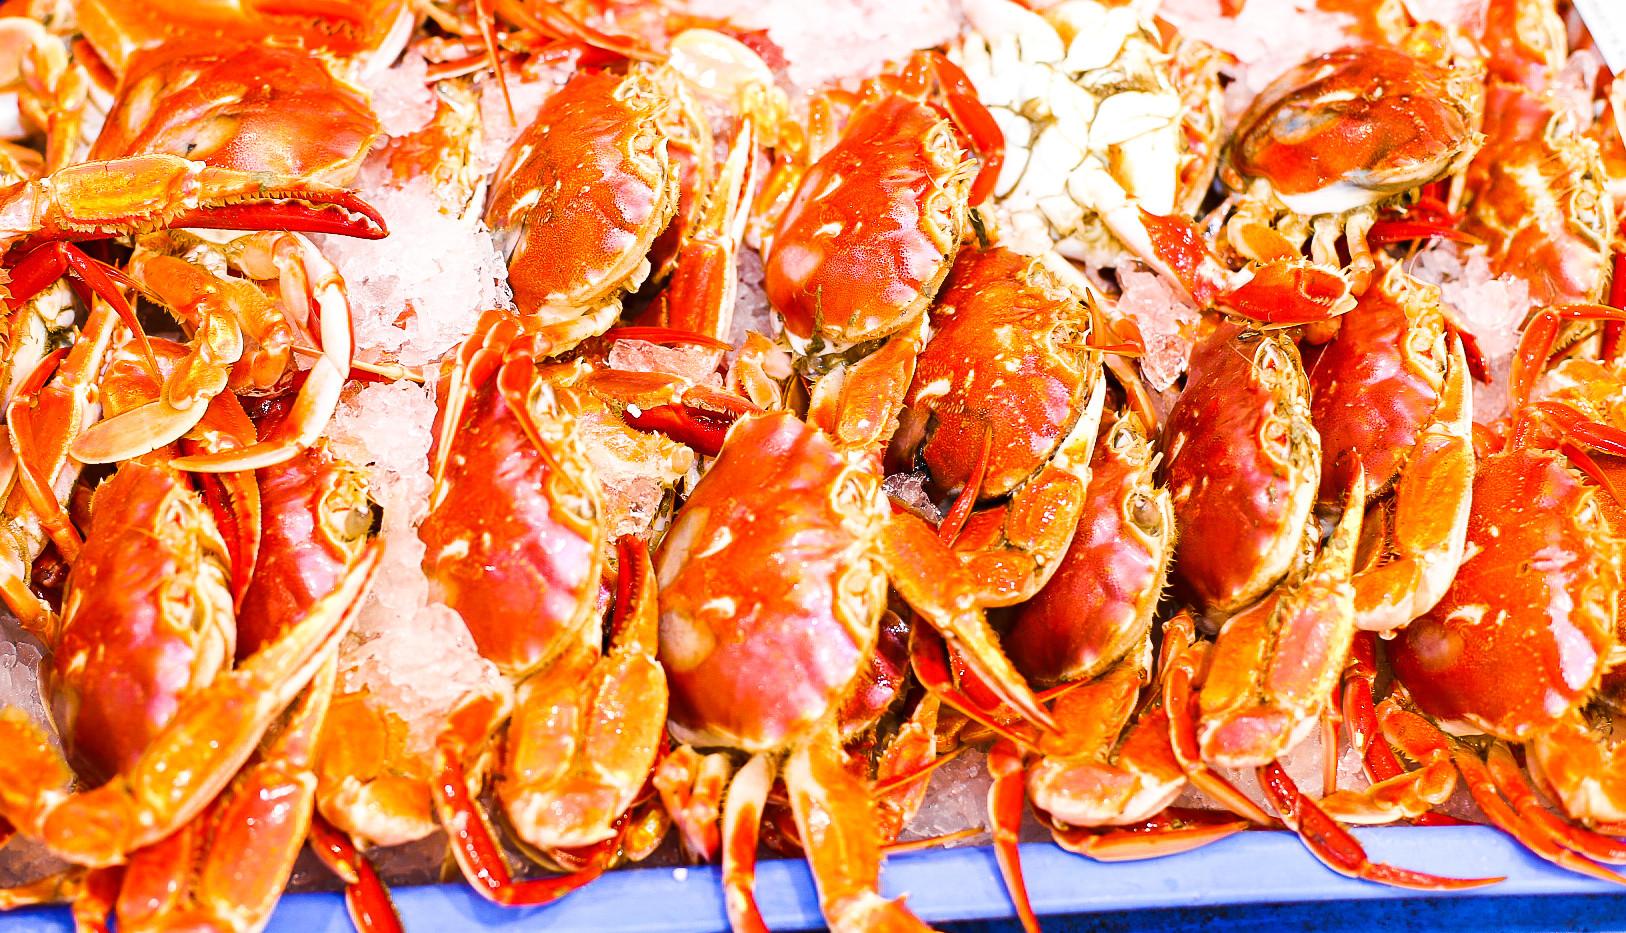 small prawns.jpg